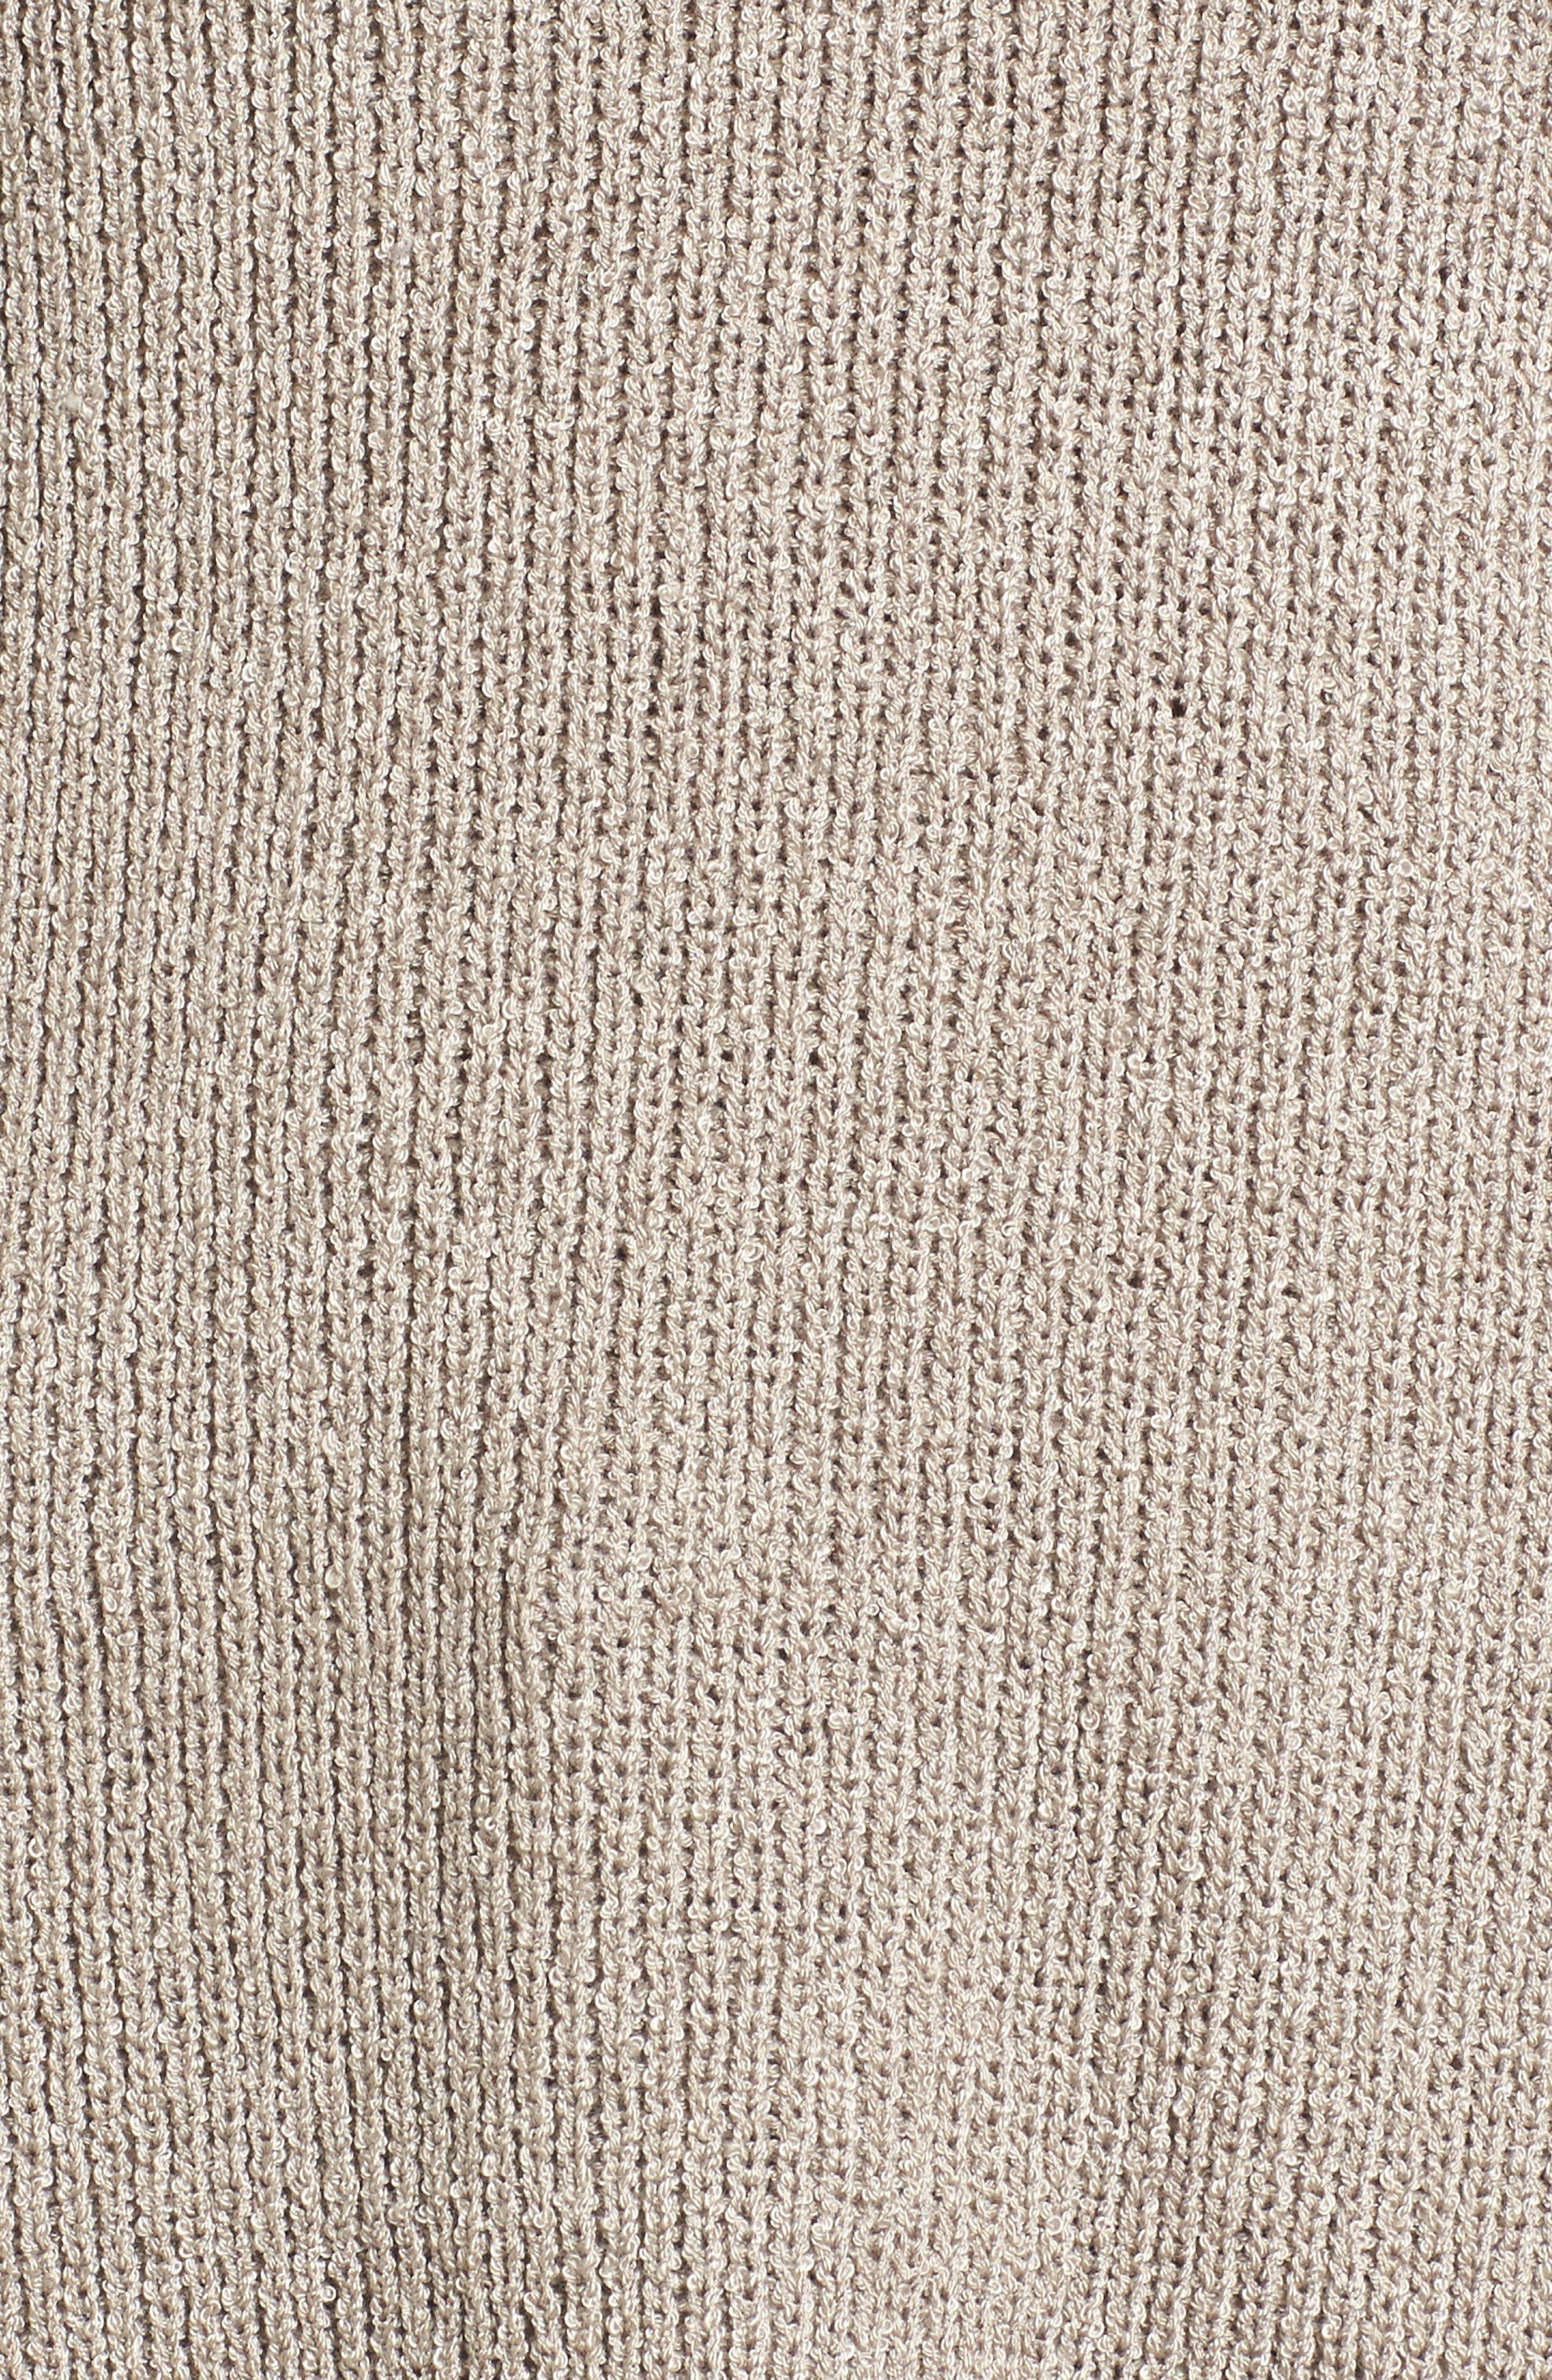 Tie Sleeve Sweater,                             Alternate thumbnail 5, color,                             268